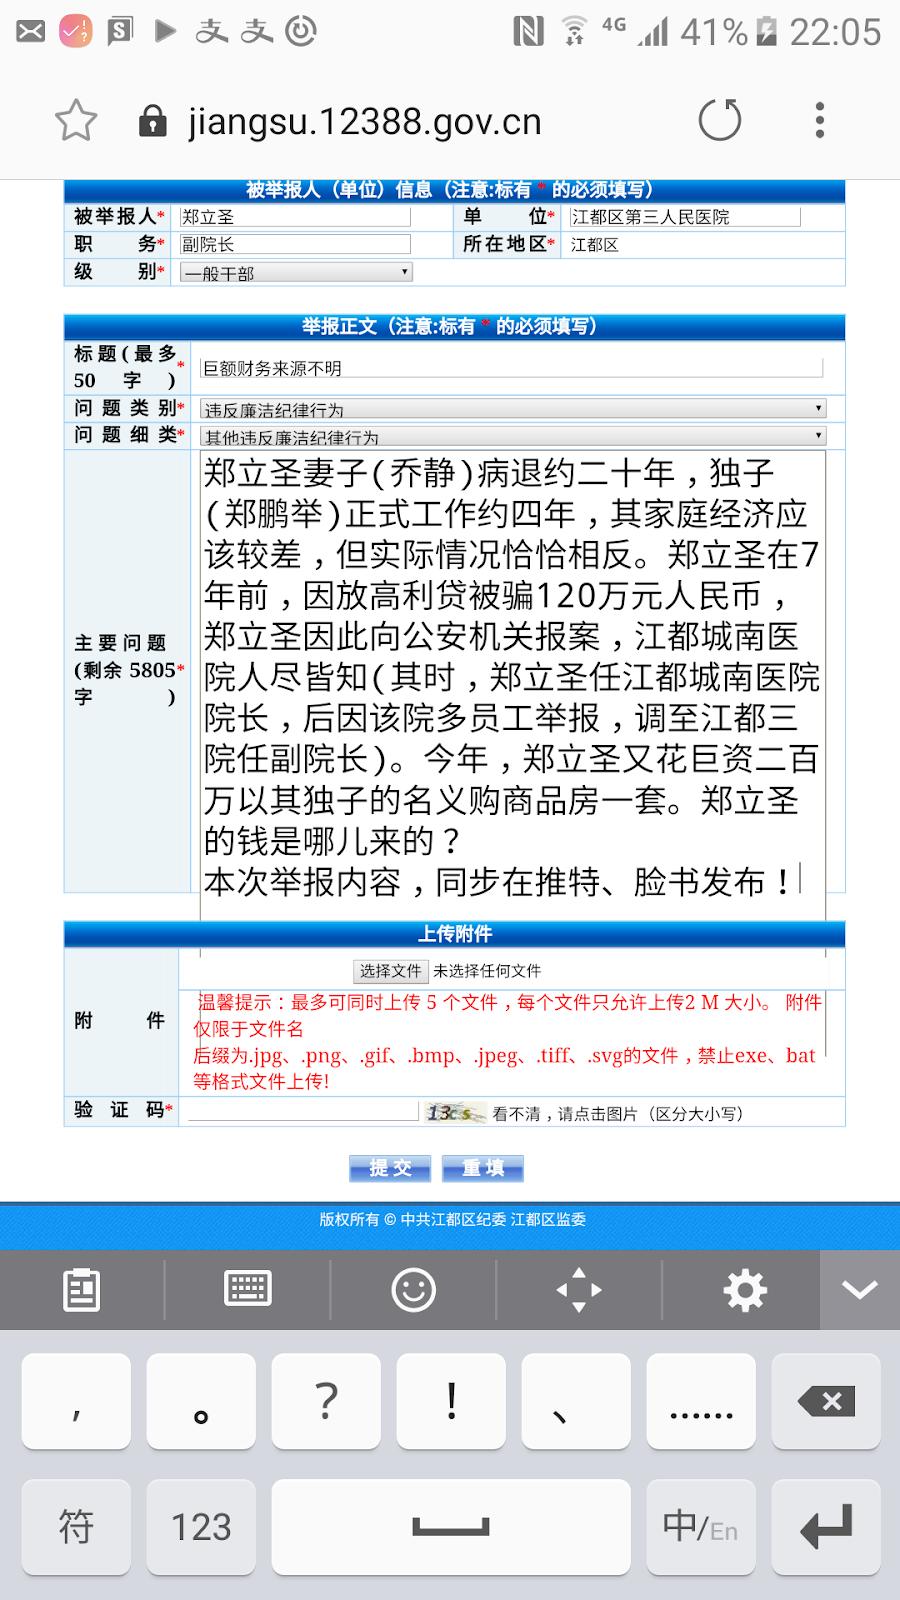 /Users/oldchen/Desktop/Screenshot_20180922-220555.png